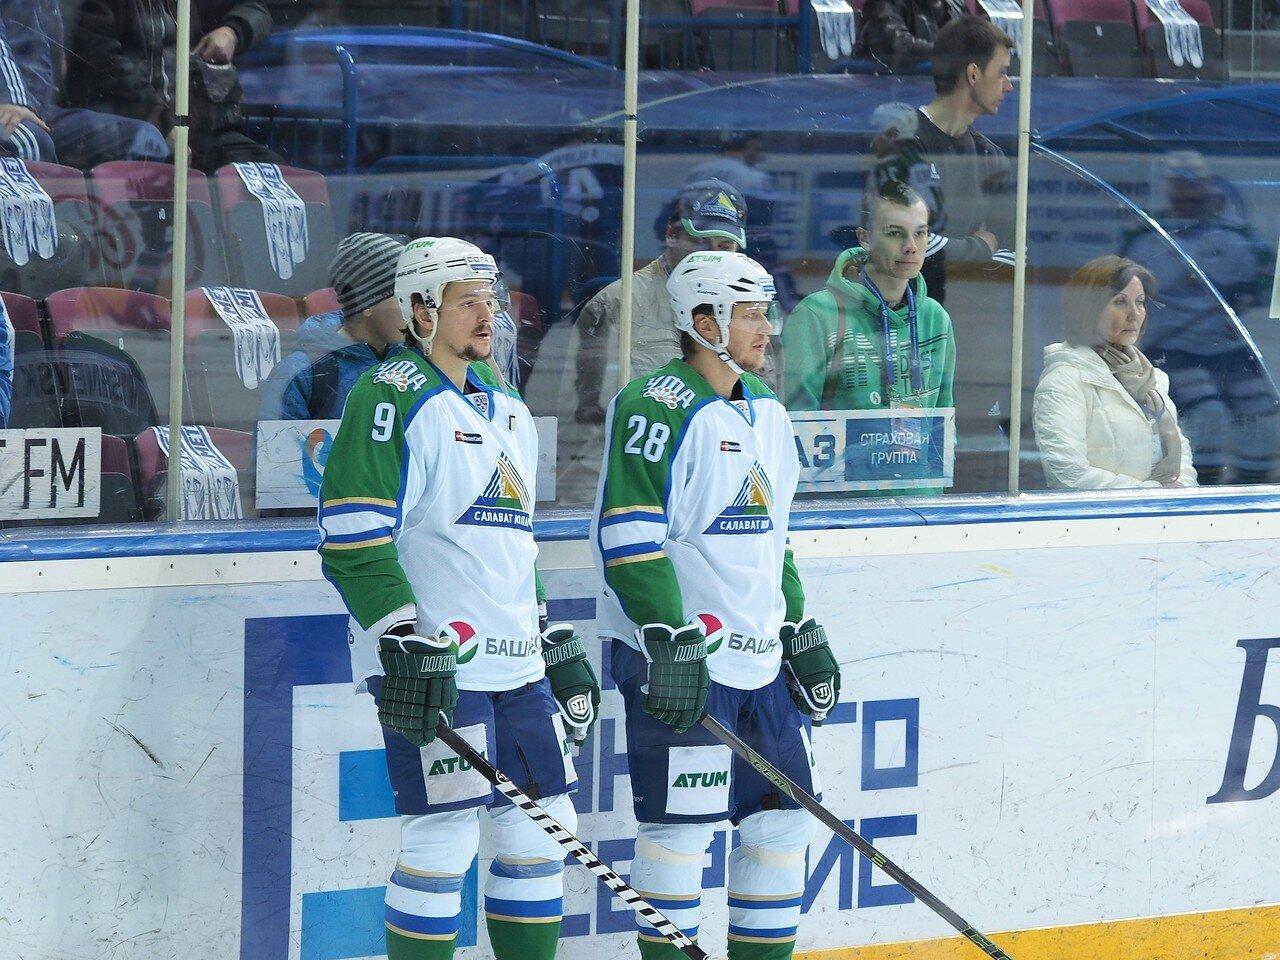 6Плей-офф 2016 Восток Финал Металлург - Салават Юлаев 31.03.2016